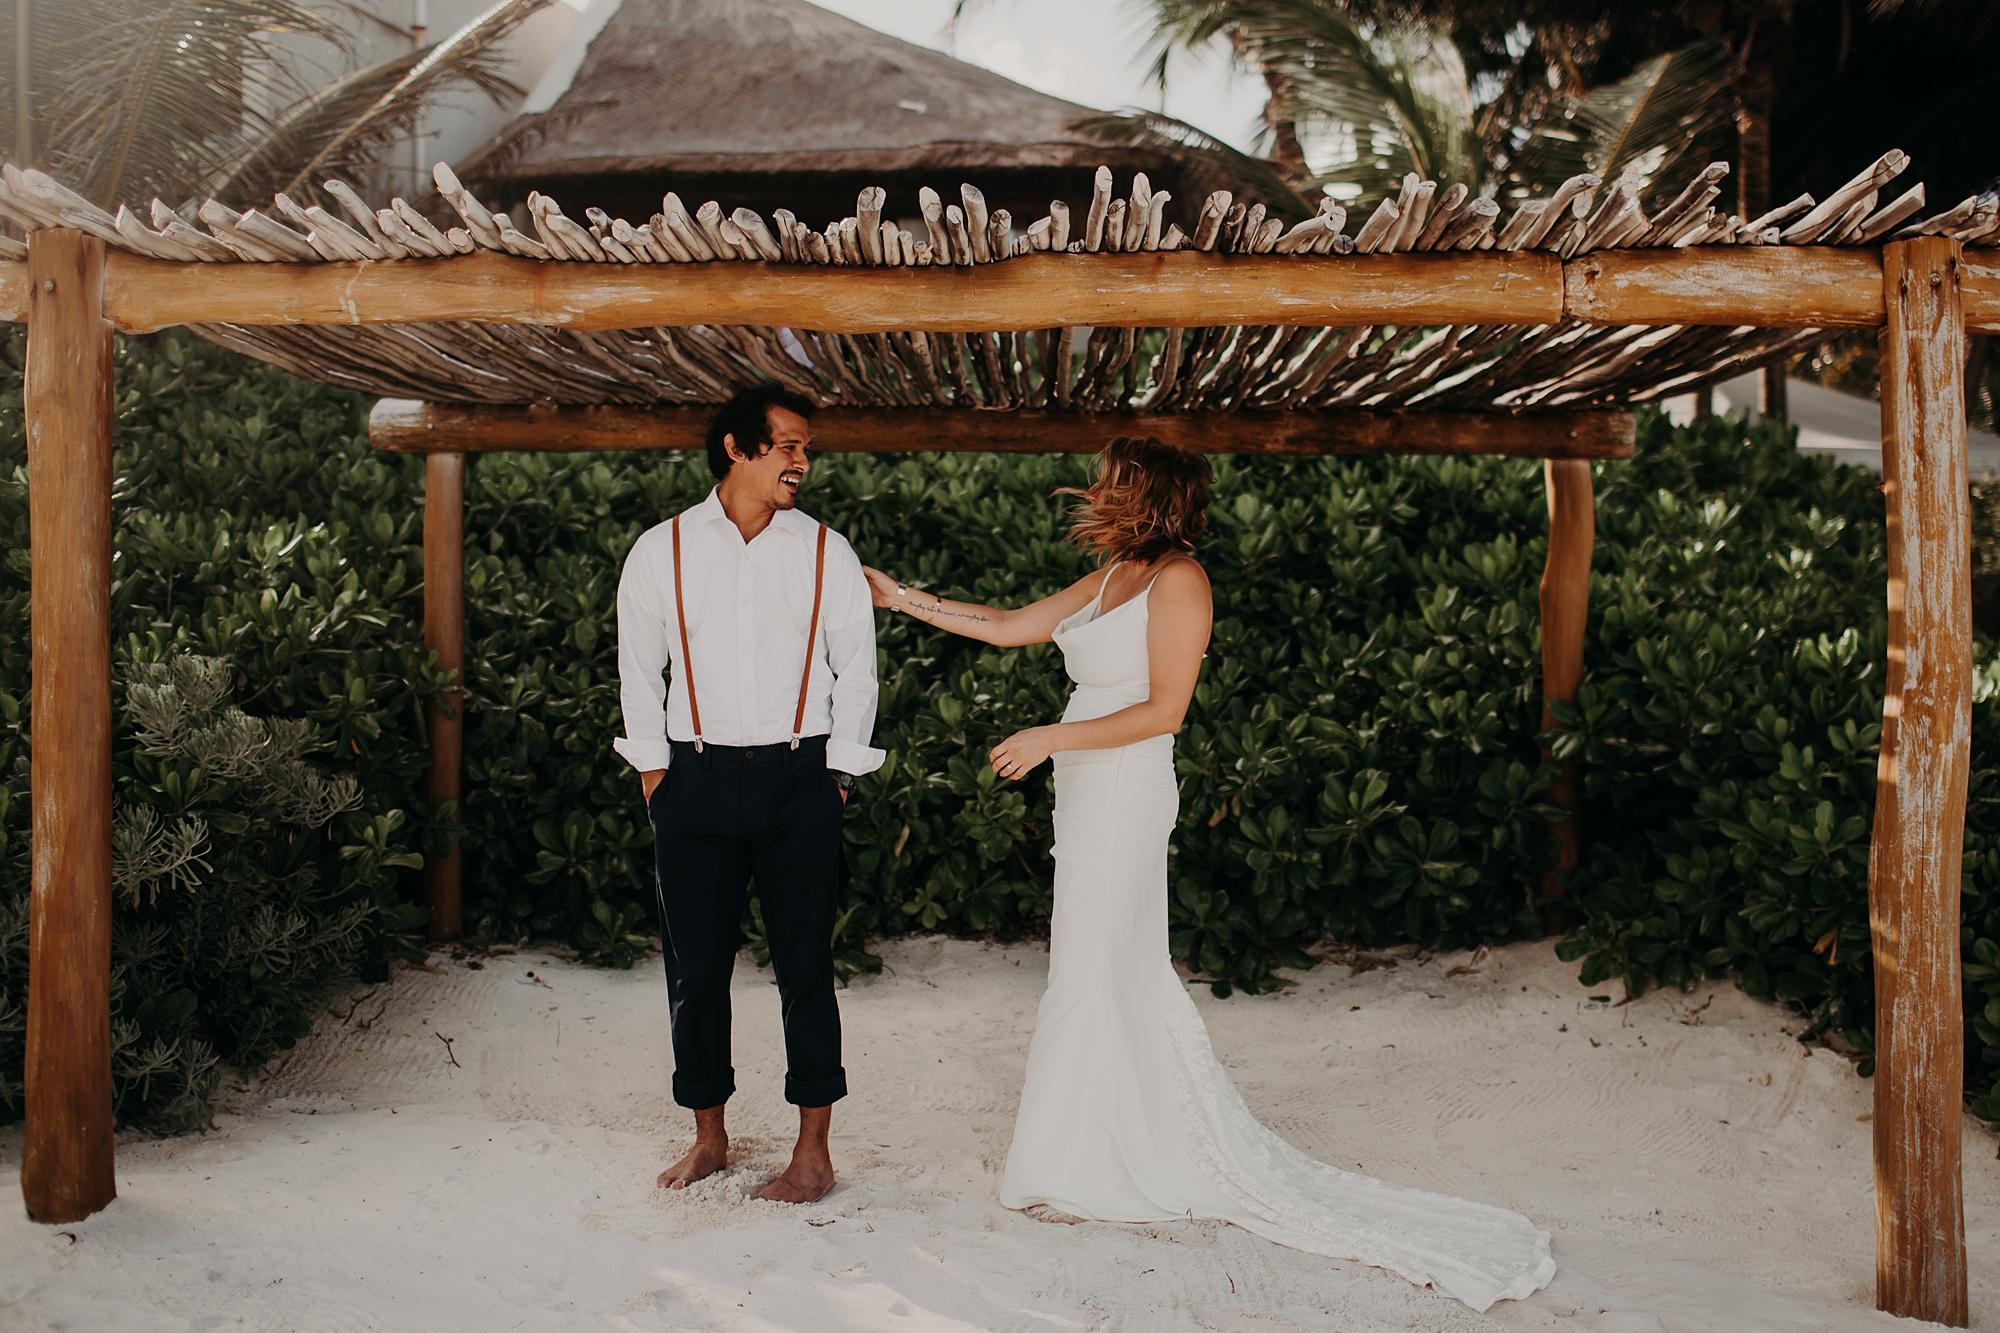 Danielle-San-Antonio-Wedding-Photographer-54_WEB.jpg